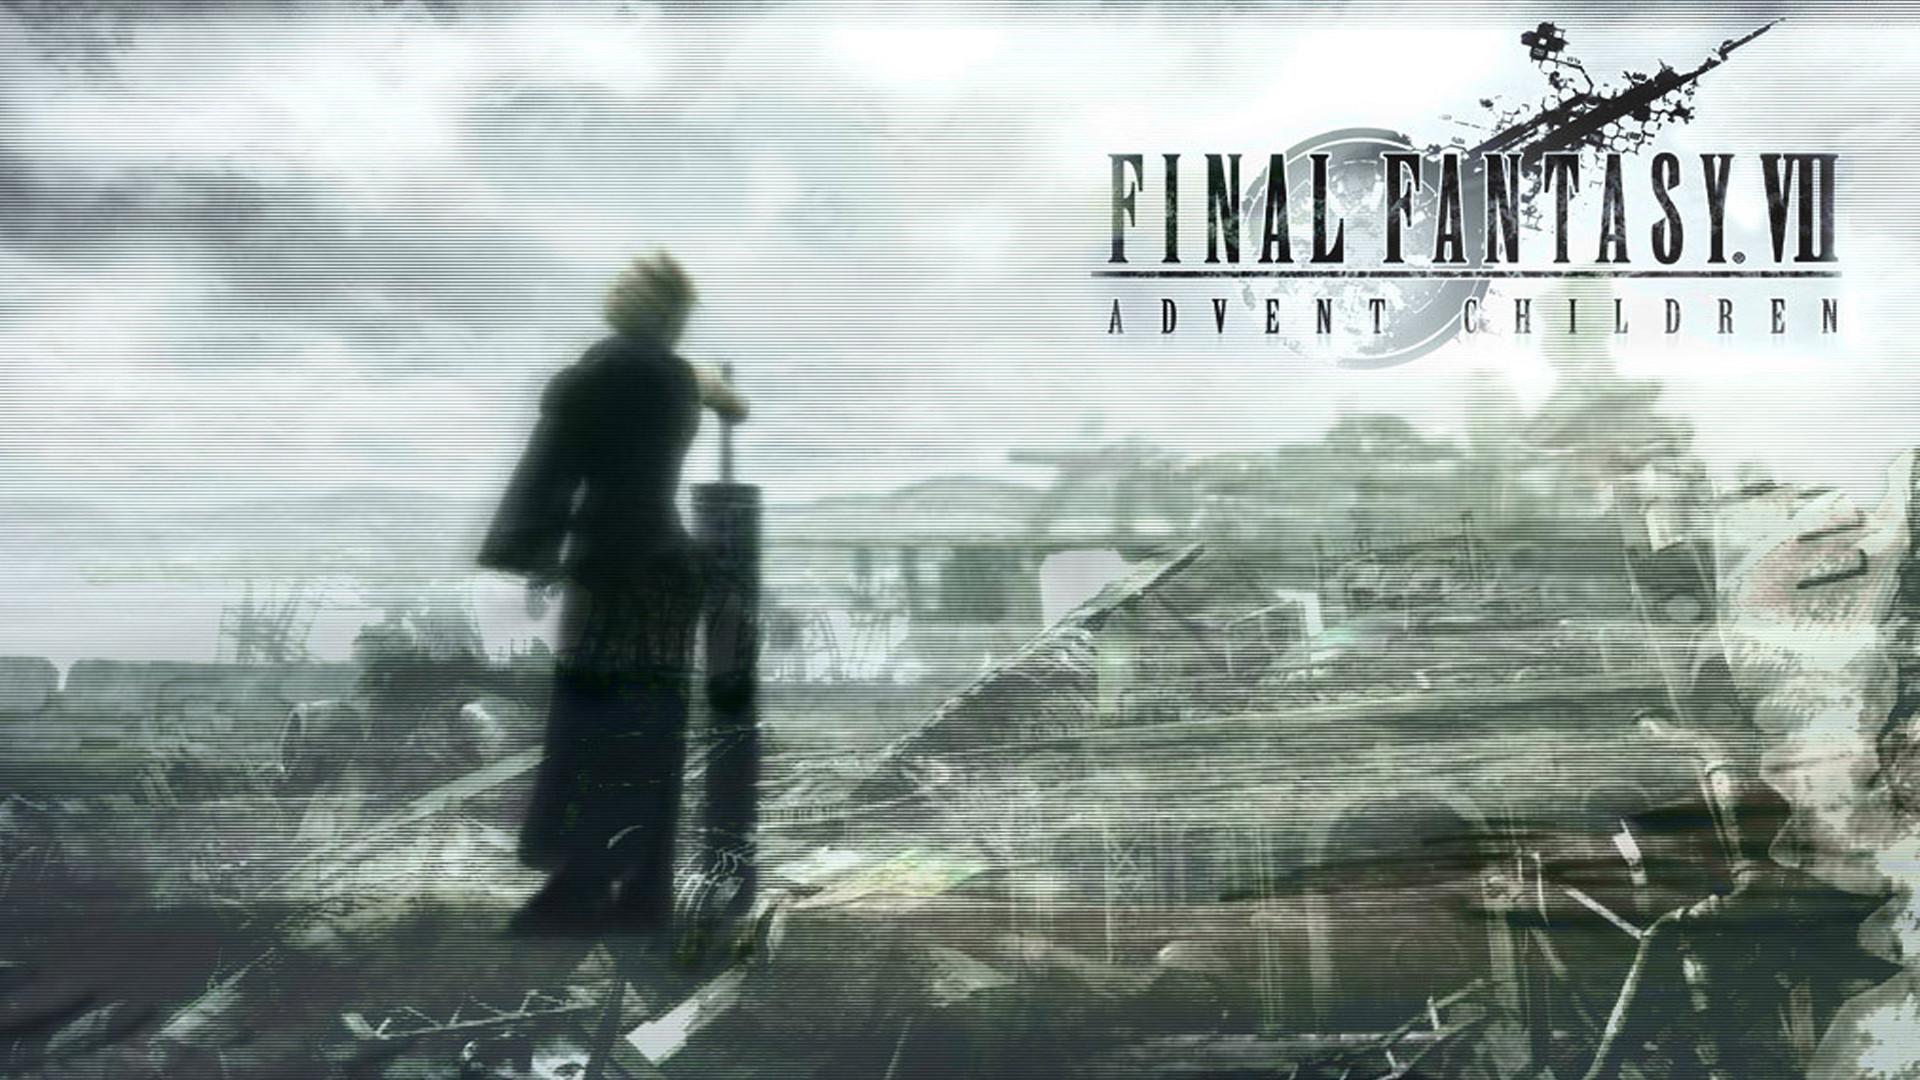 Final Fantasy 7 Advent Children Wallpaper Wallpapertag